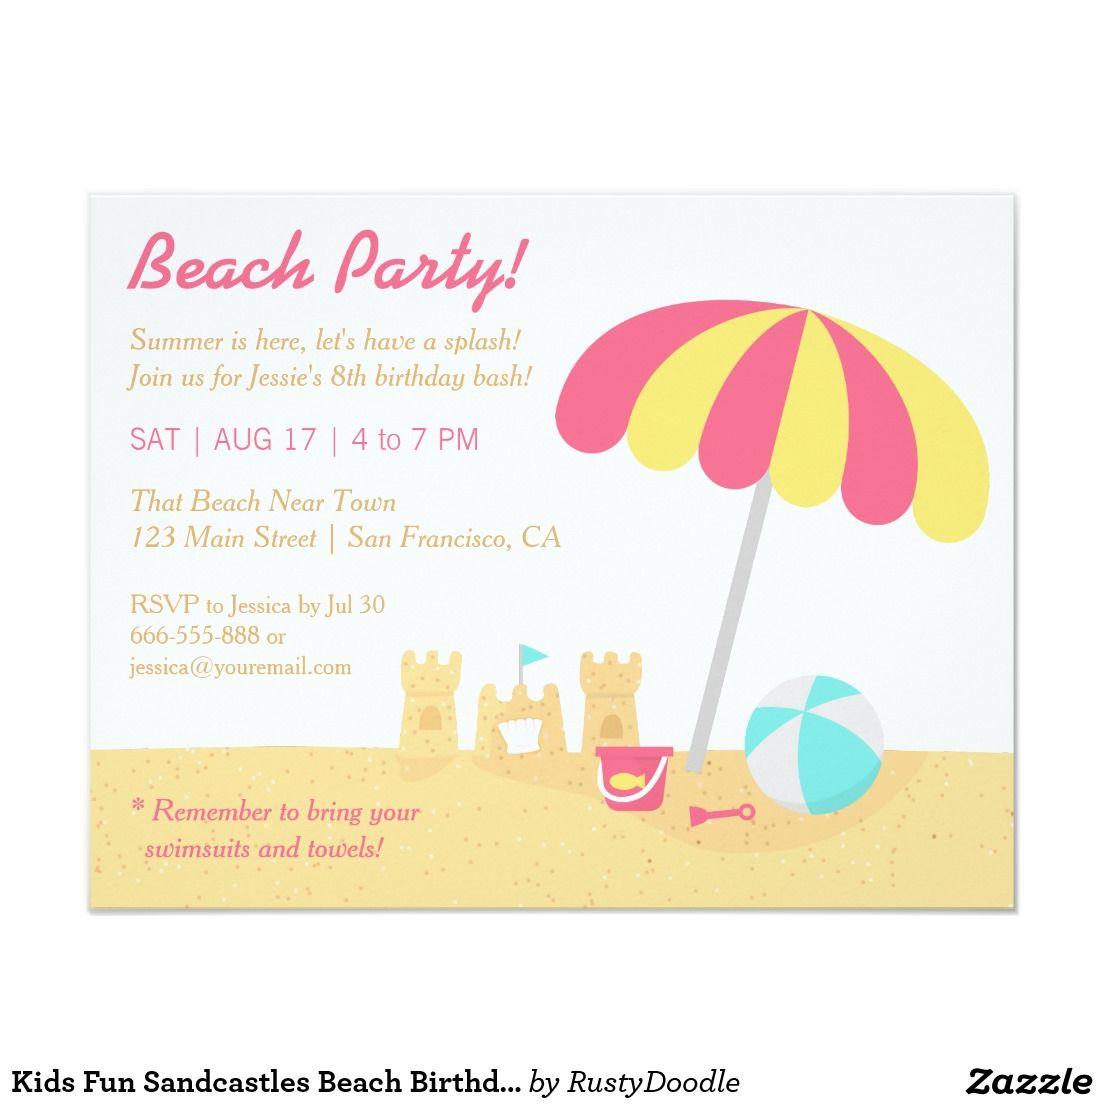 Kids Fun Sandcastles Beach Birthday Party Invitation | Lillian\'s 2nd ...